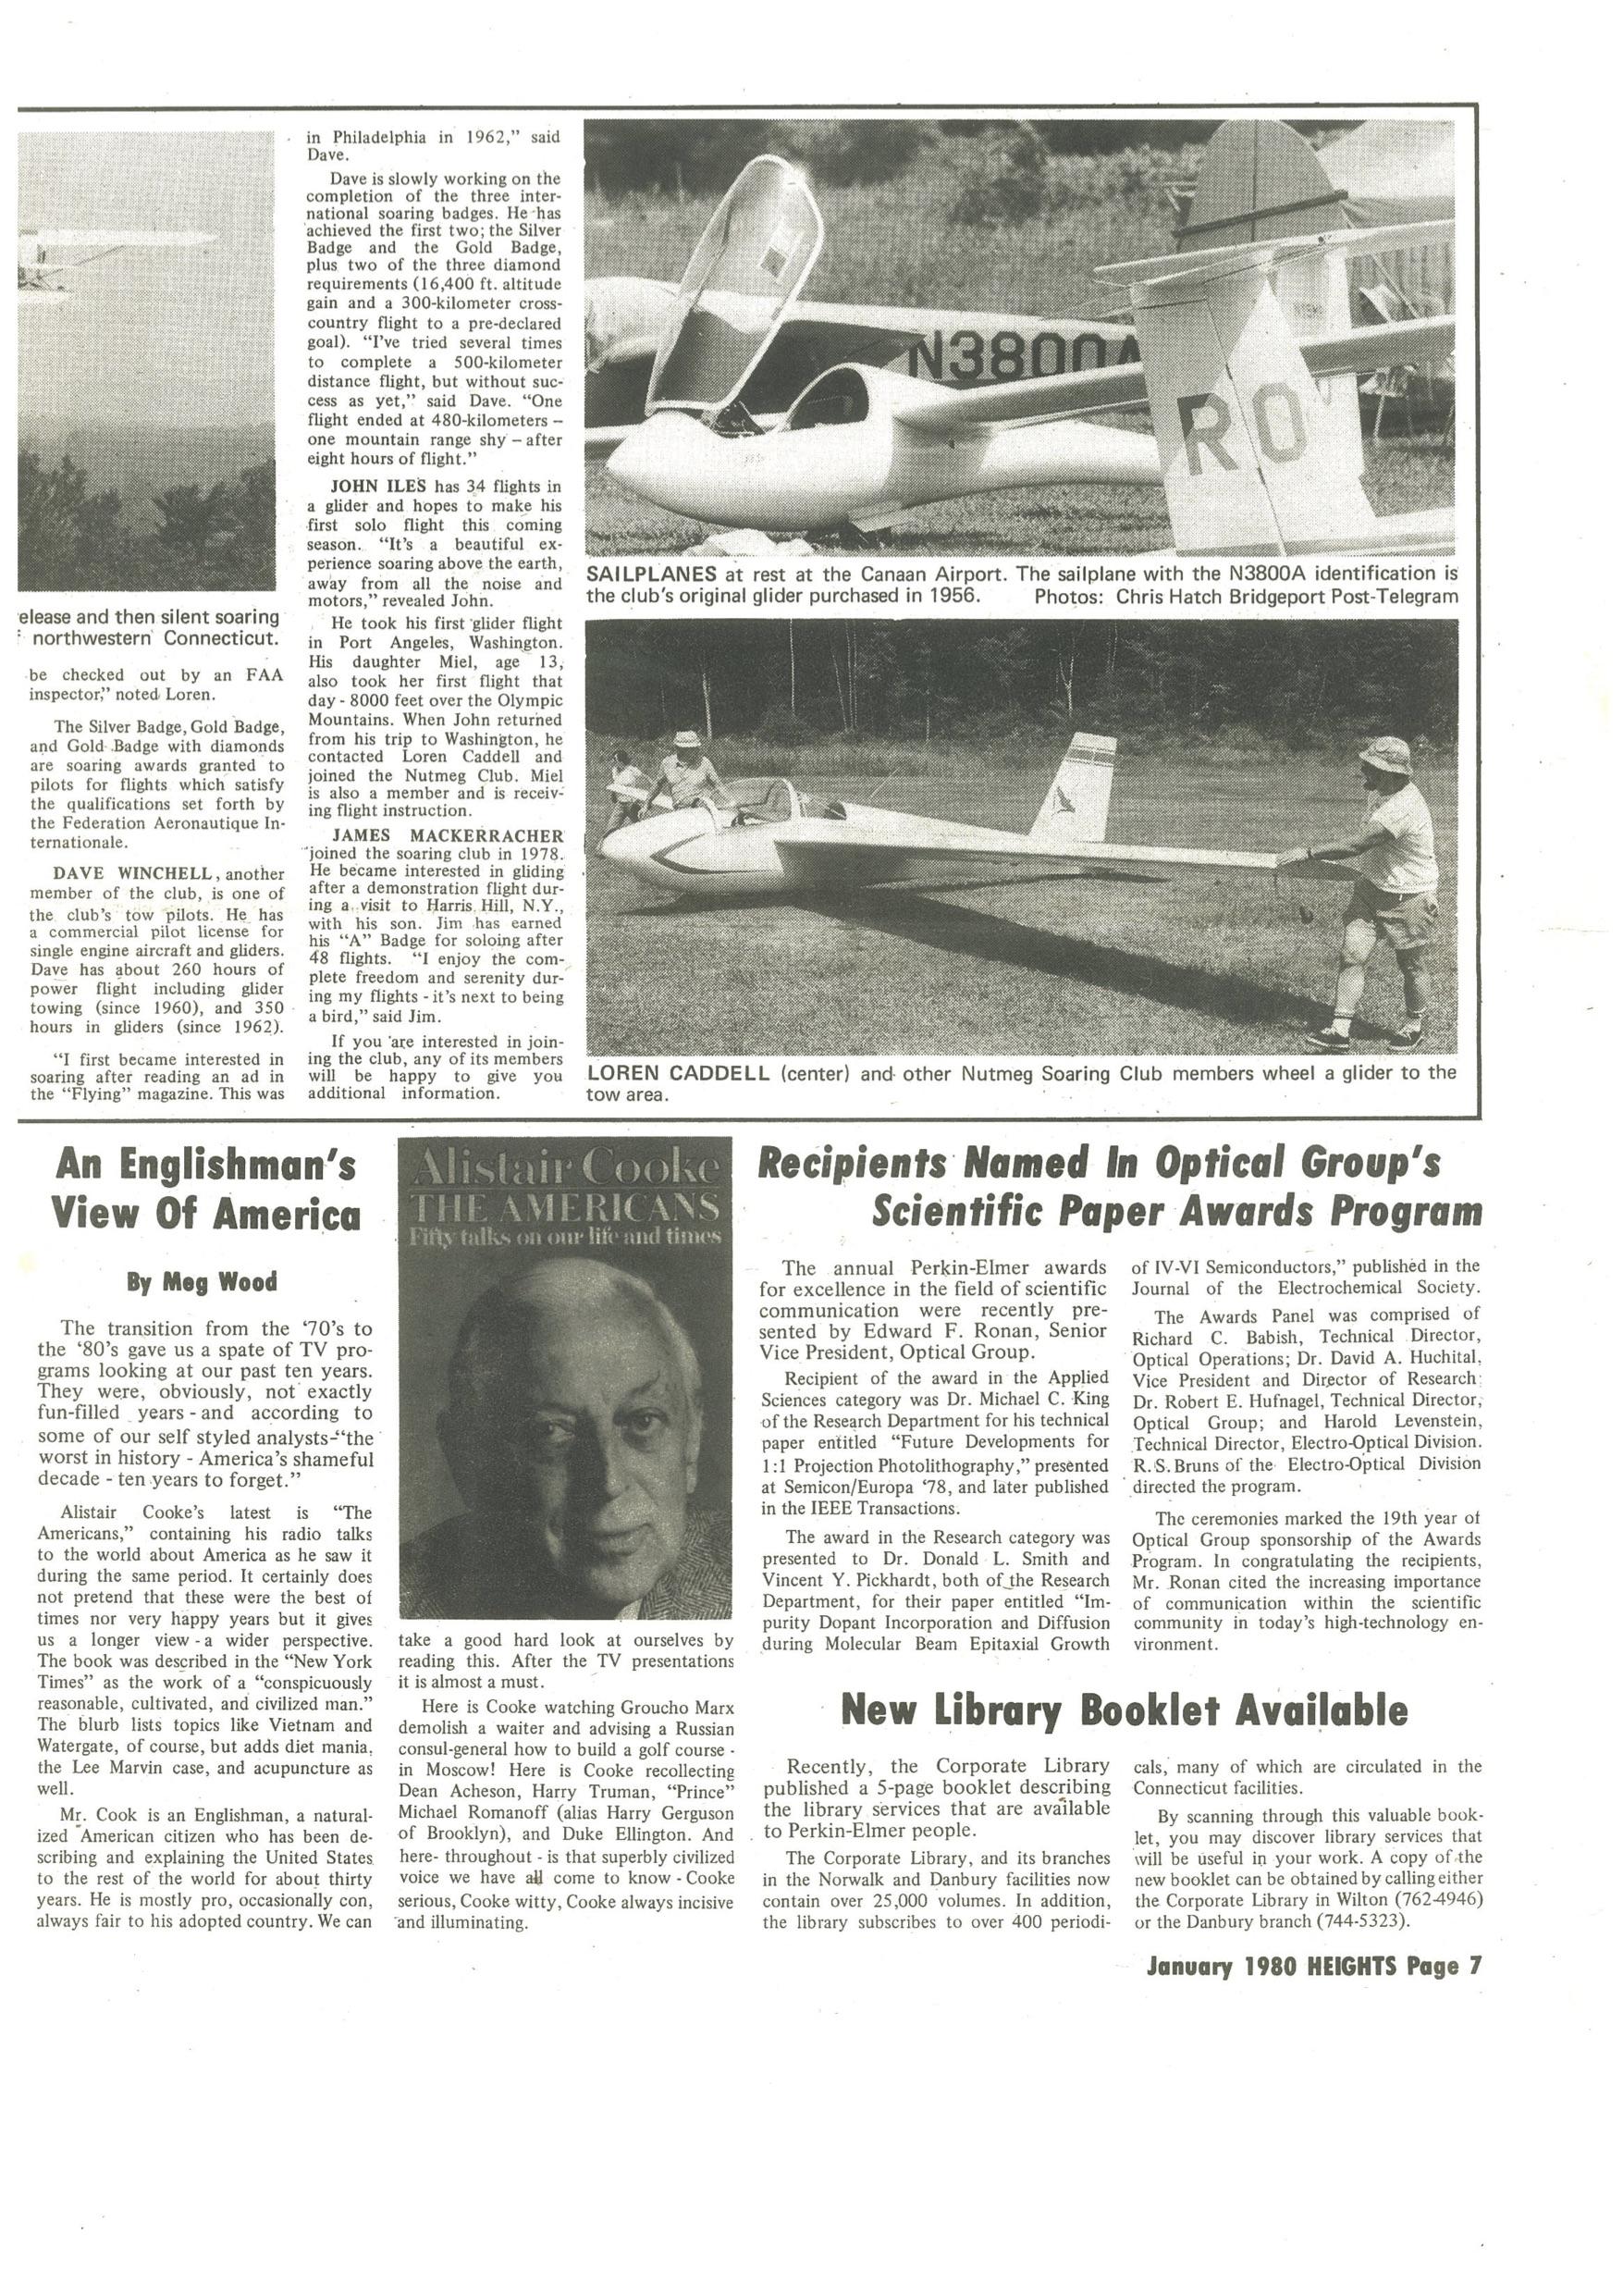 vol 13 num 4, page 7.jpg